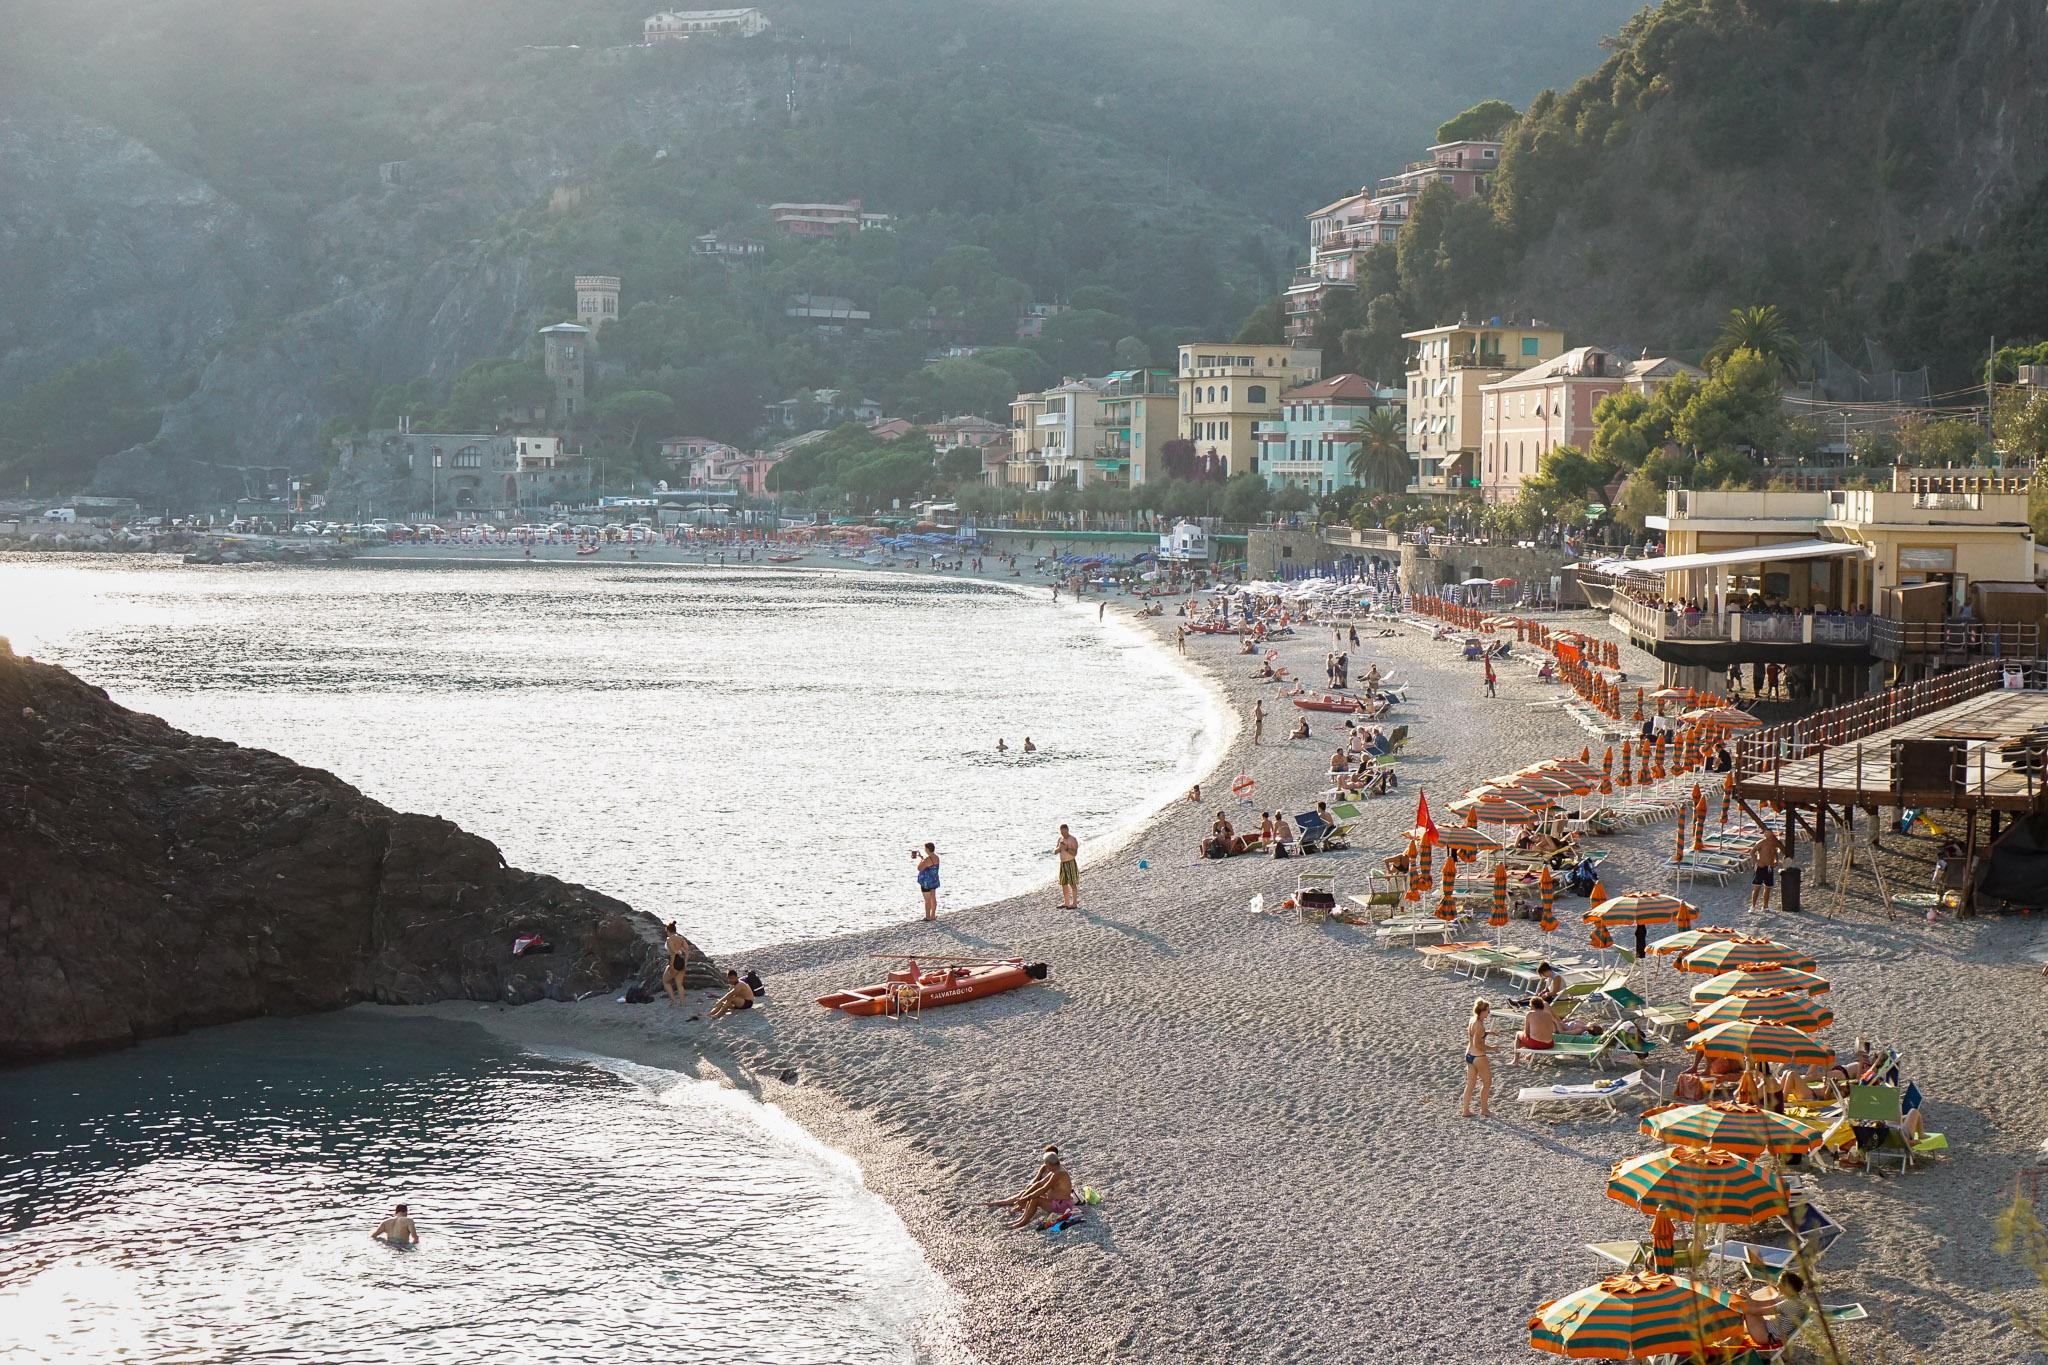 Fegina Beach in Monterosso.